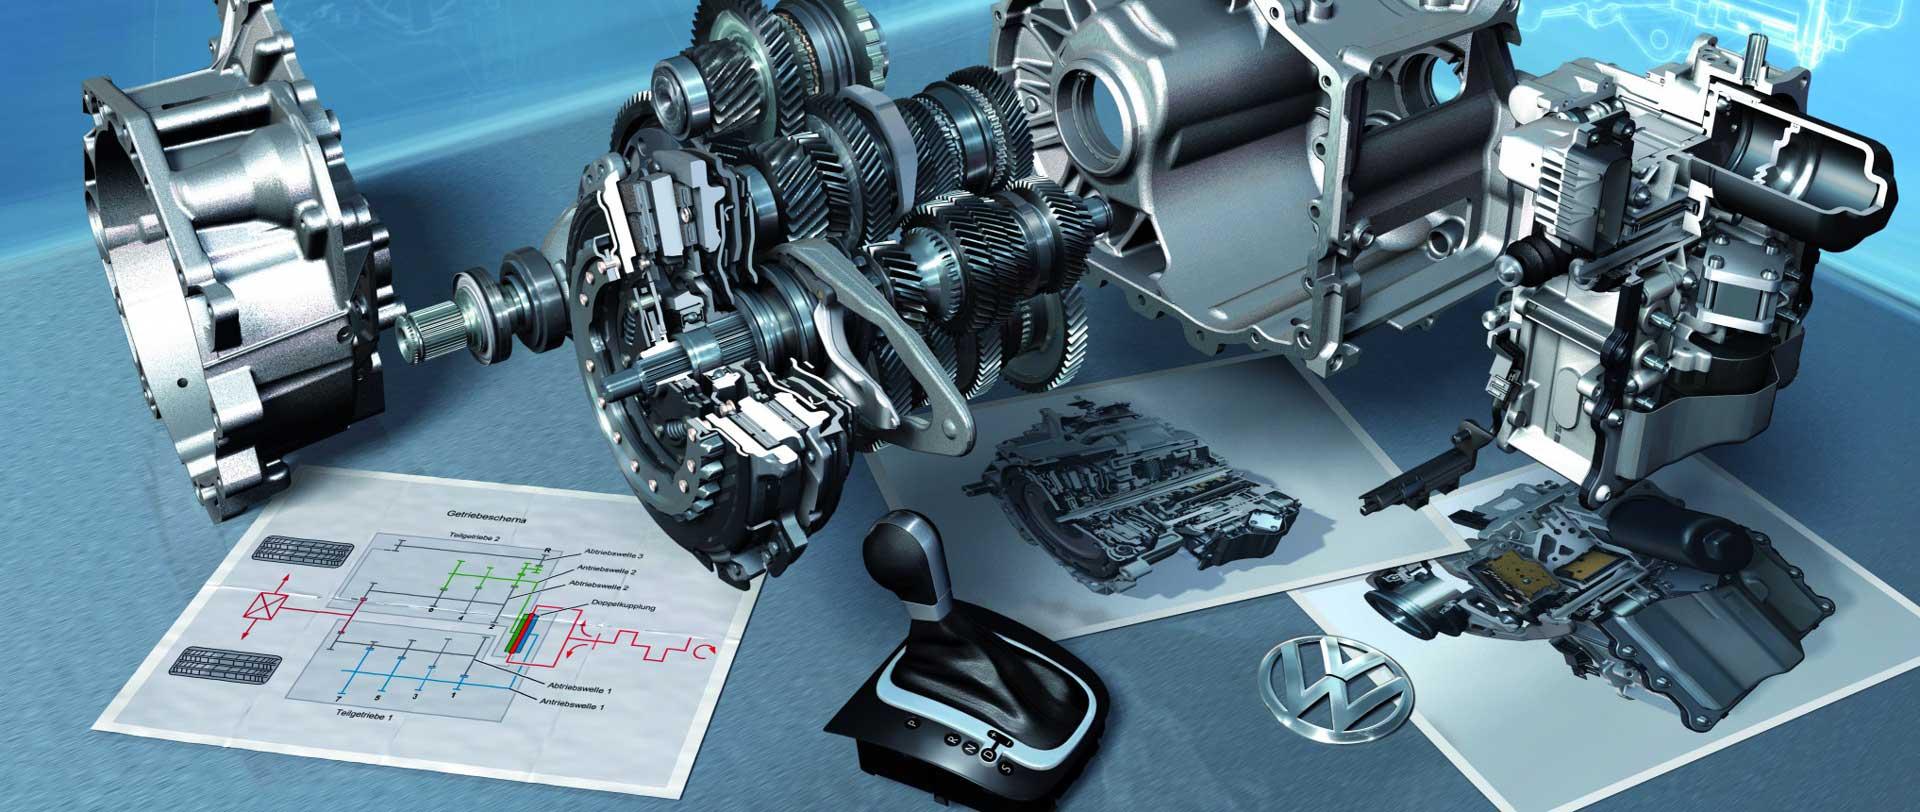 Ремонт АКПП Volkswagen недорого